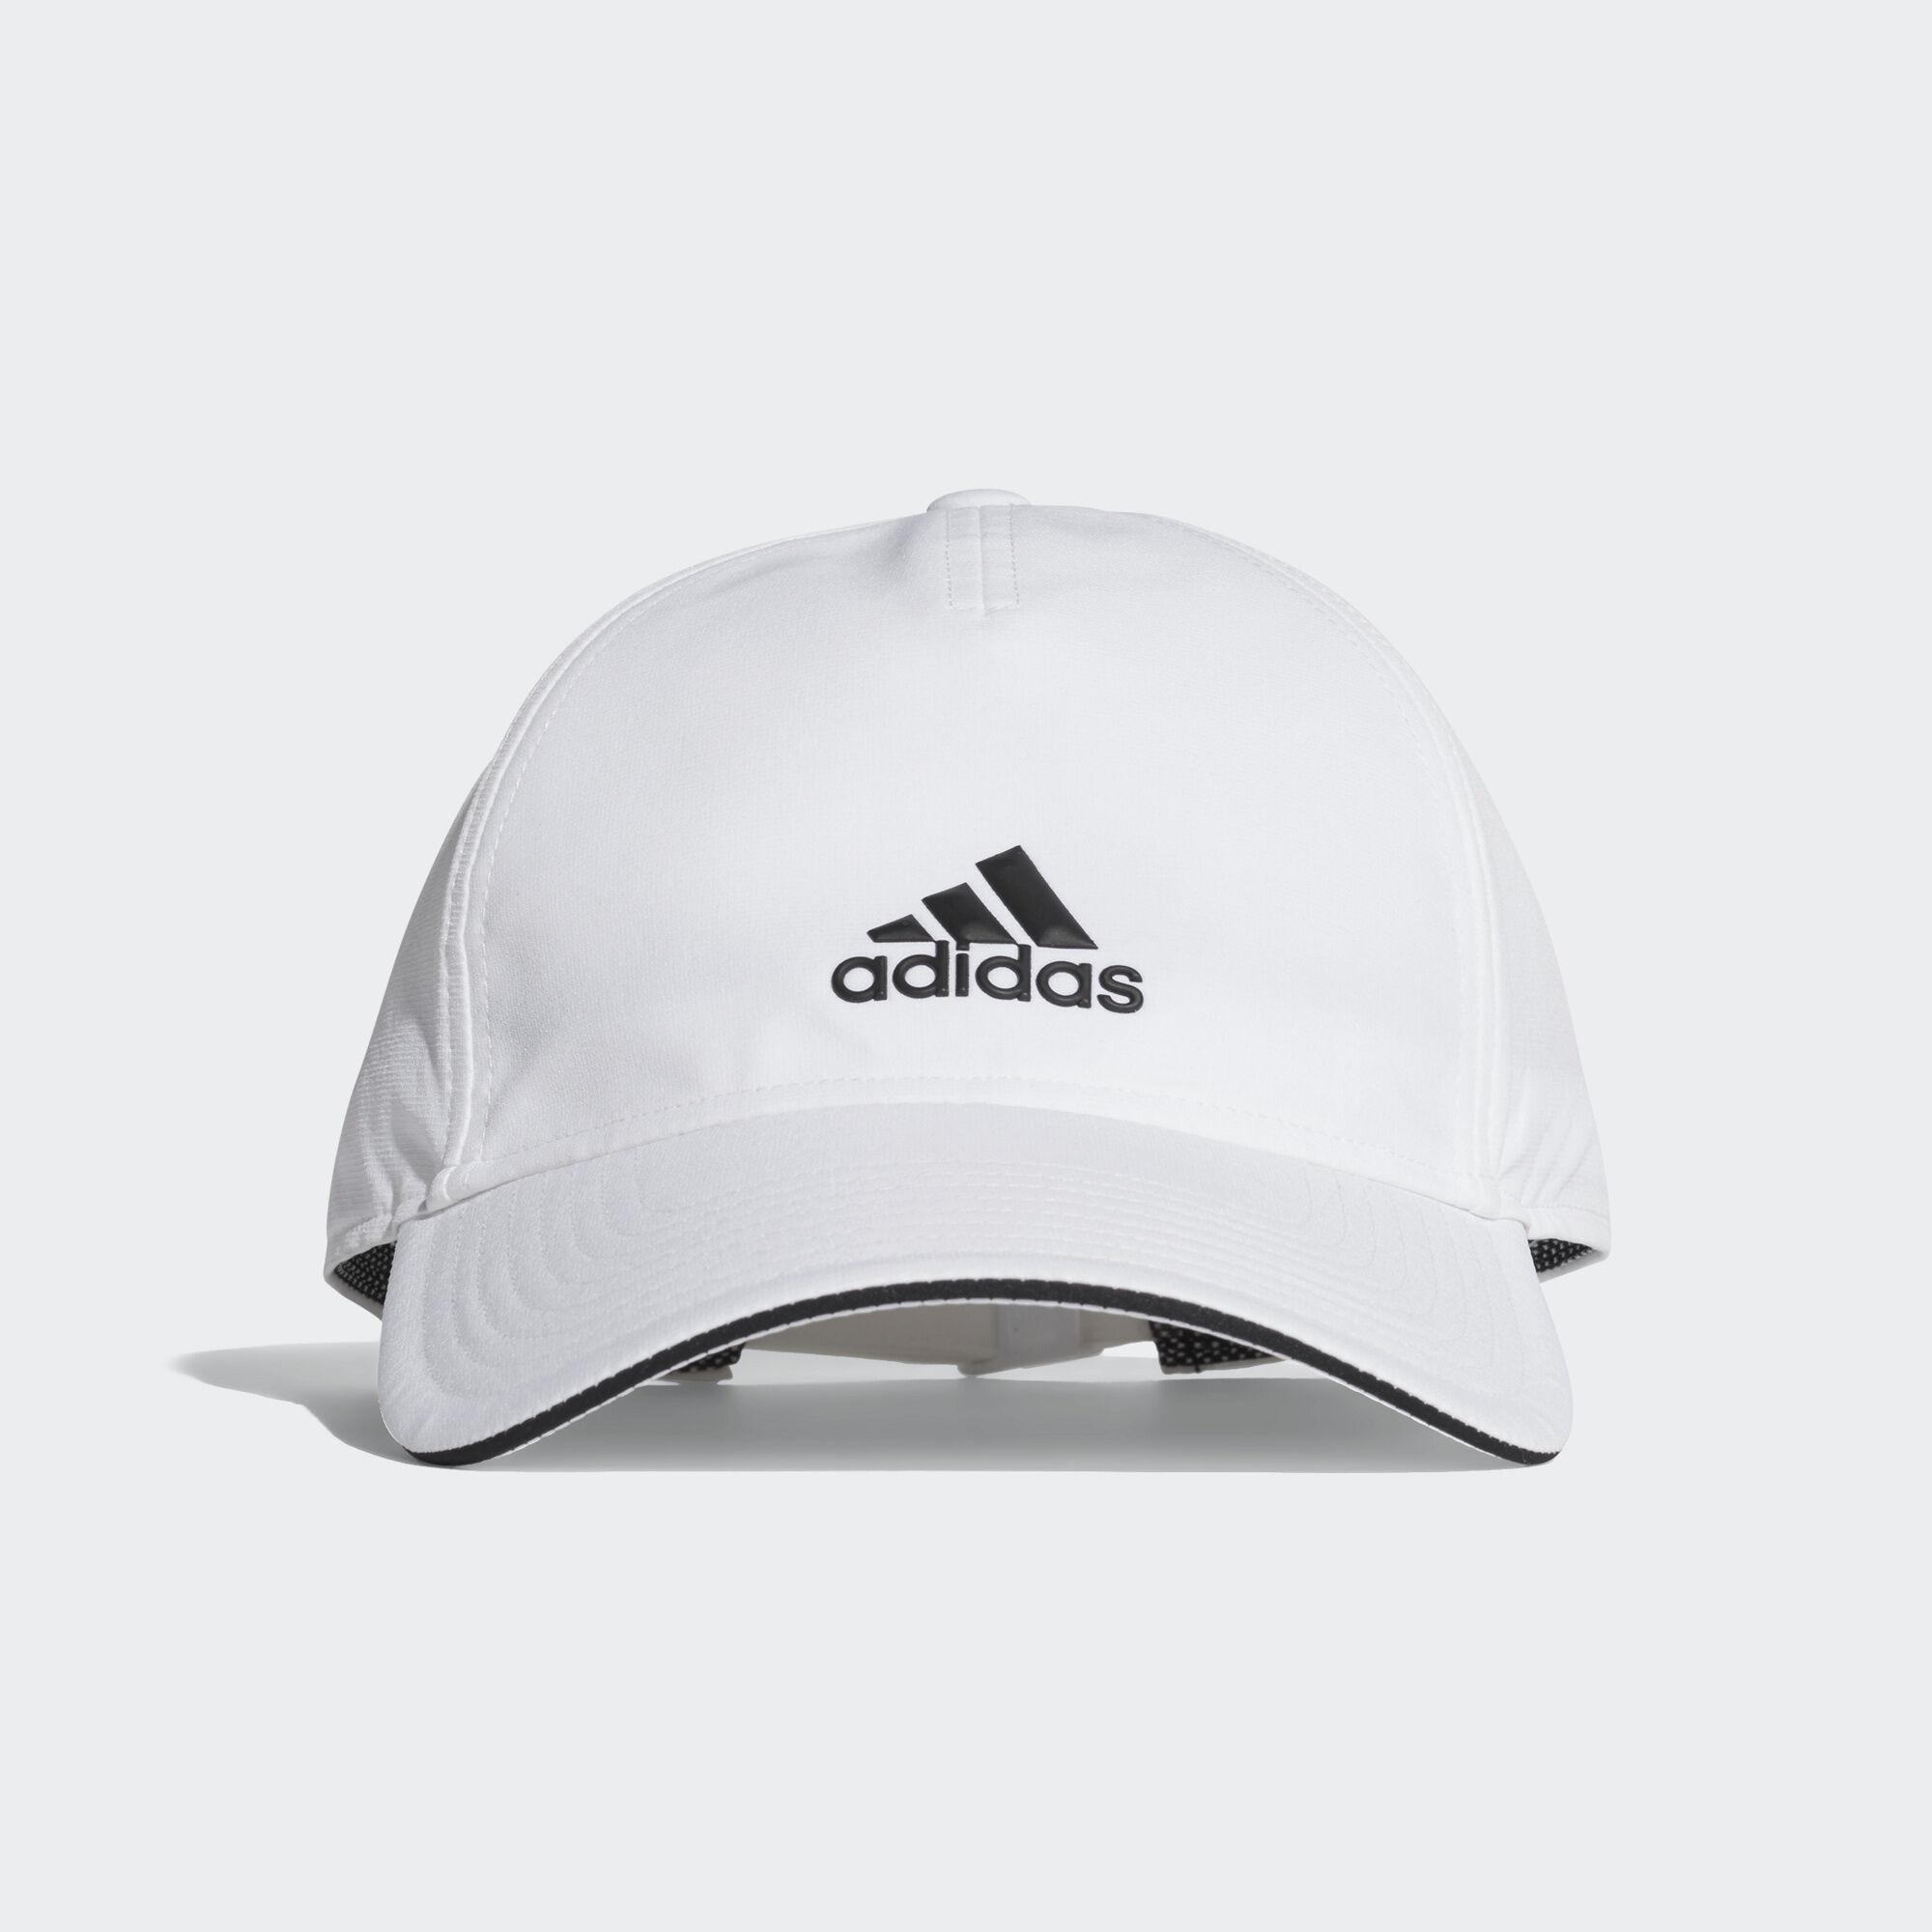 adidas - C40 Climalite Cap White Black Black CG1780 eb323d9d9e9